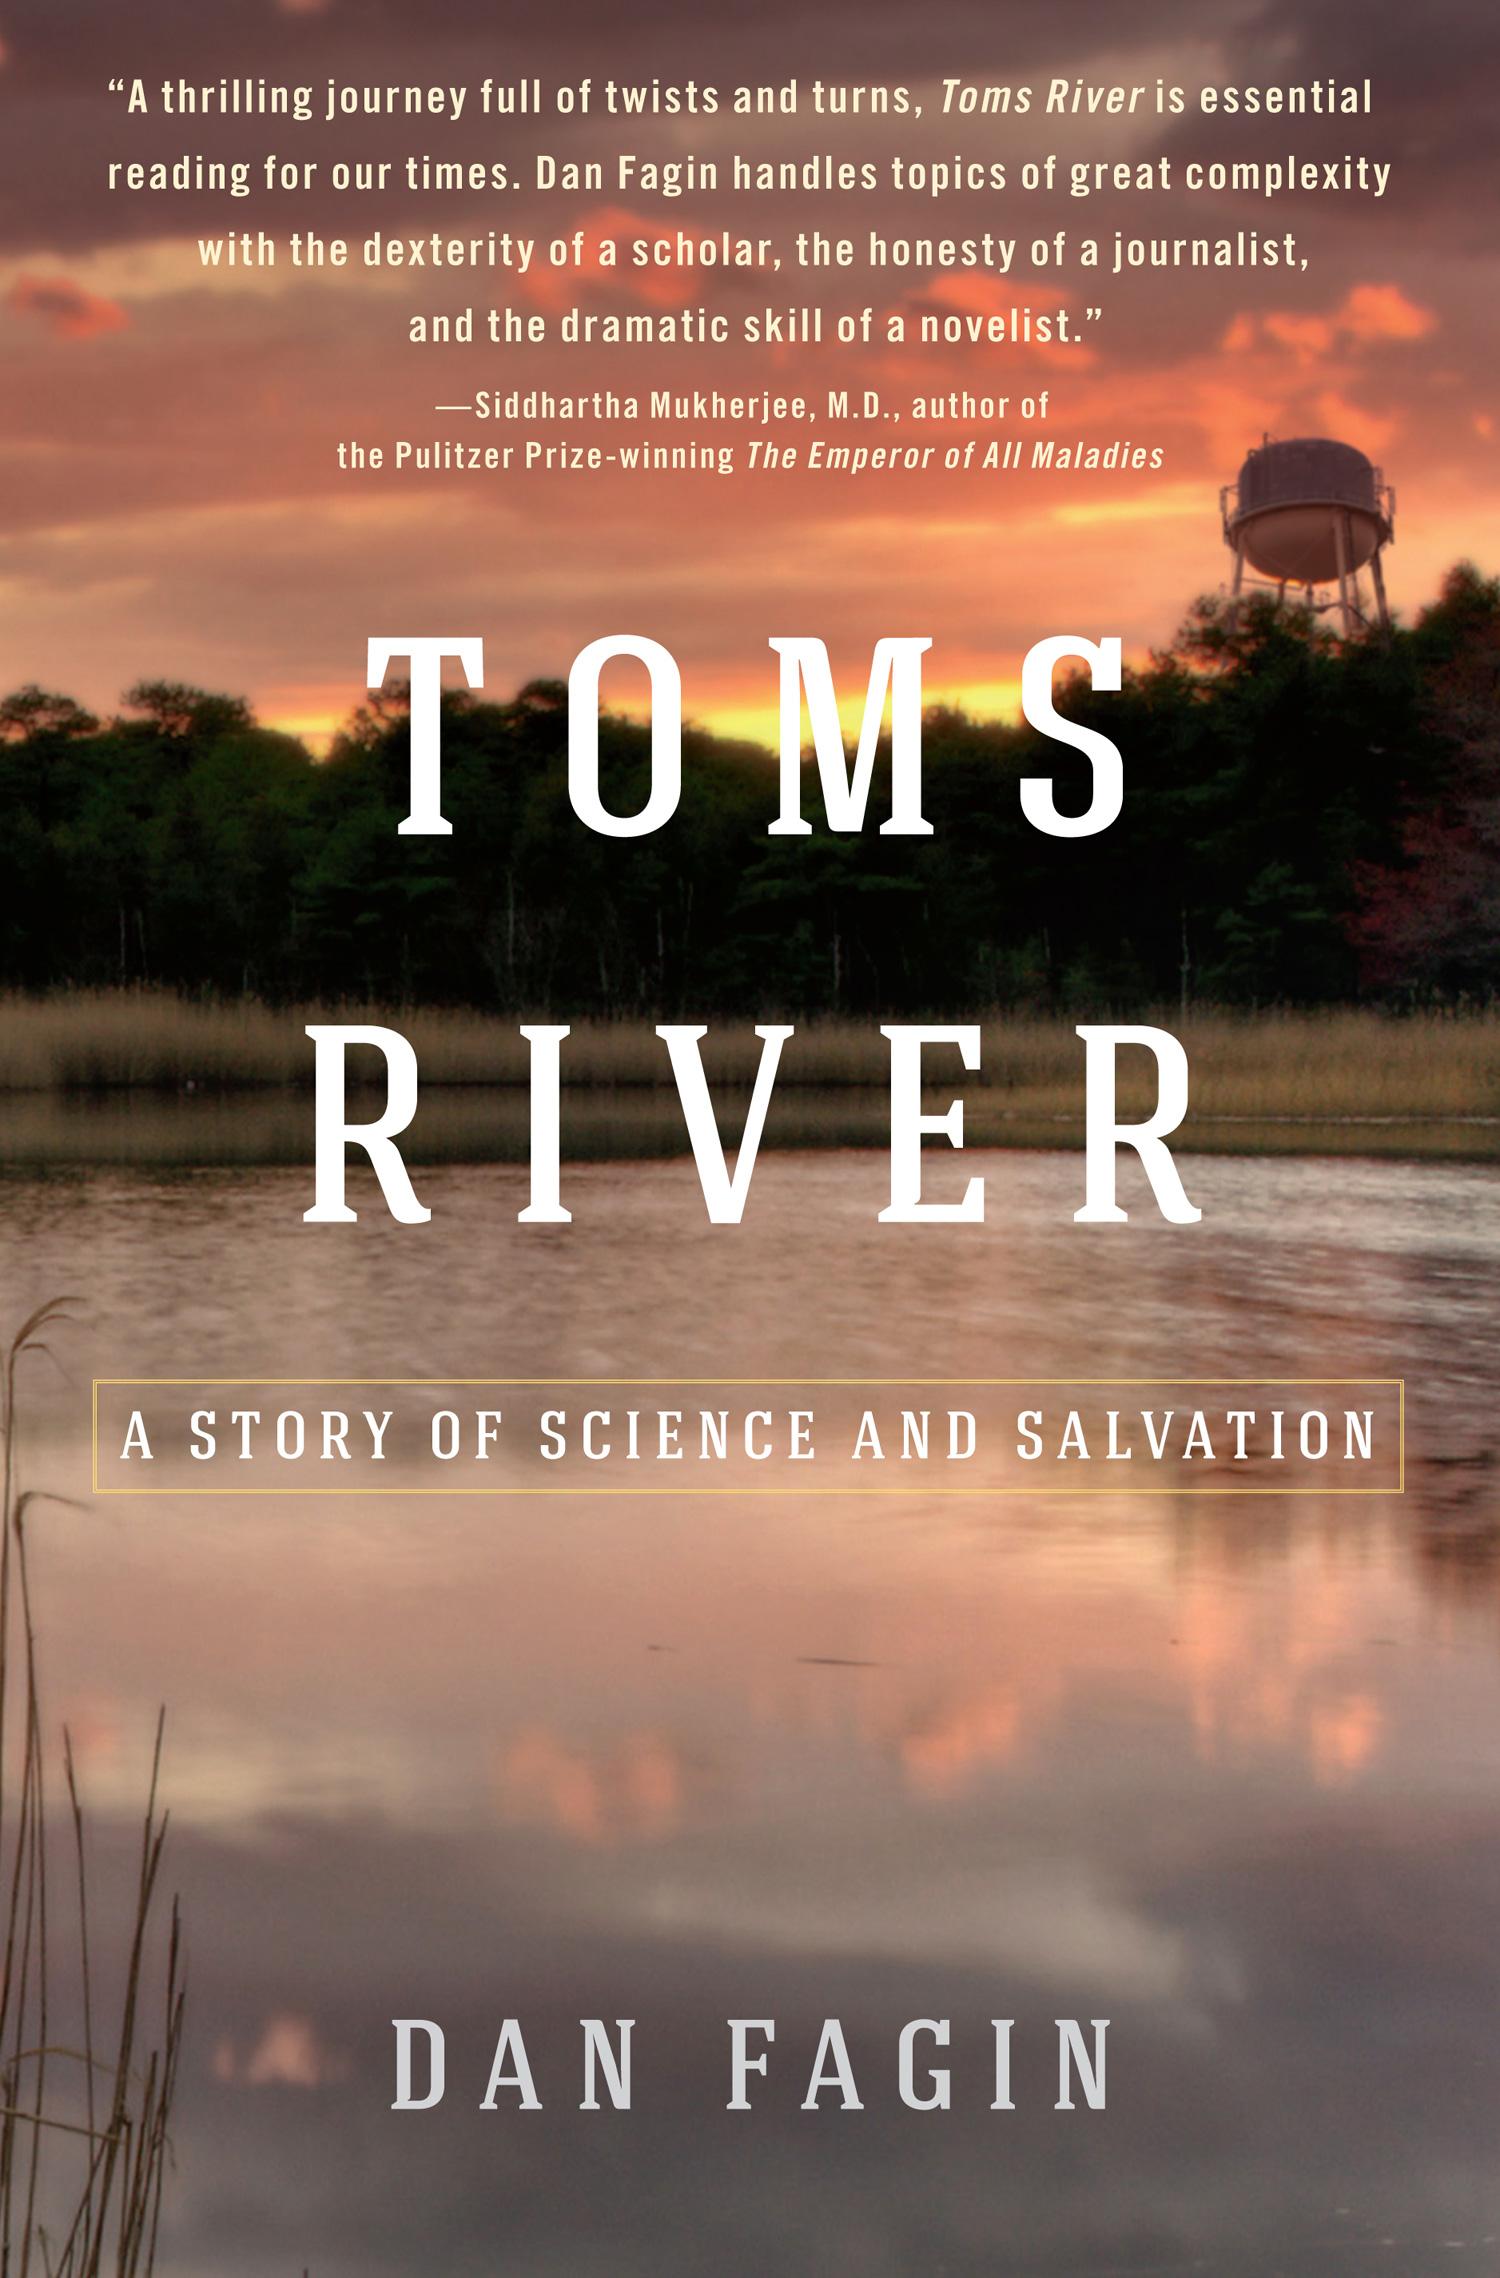 TOMS-RIVER-ss6.jpg